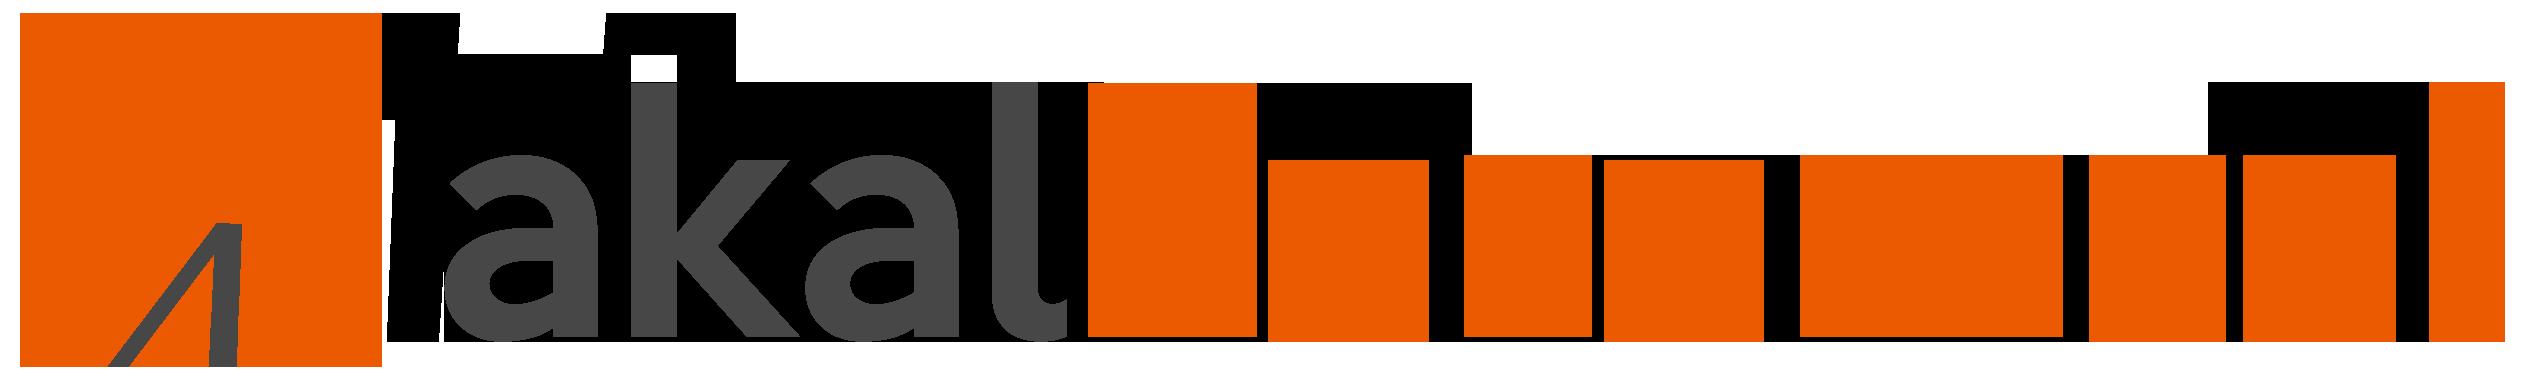 Akal Kurumsal